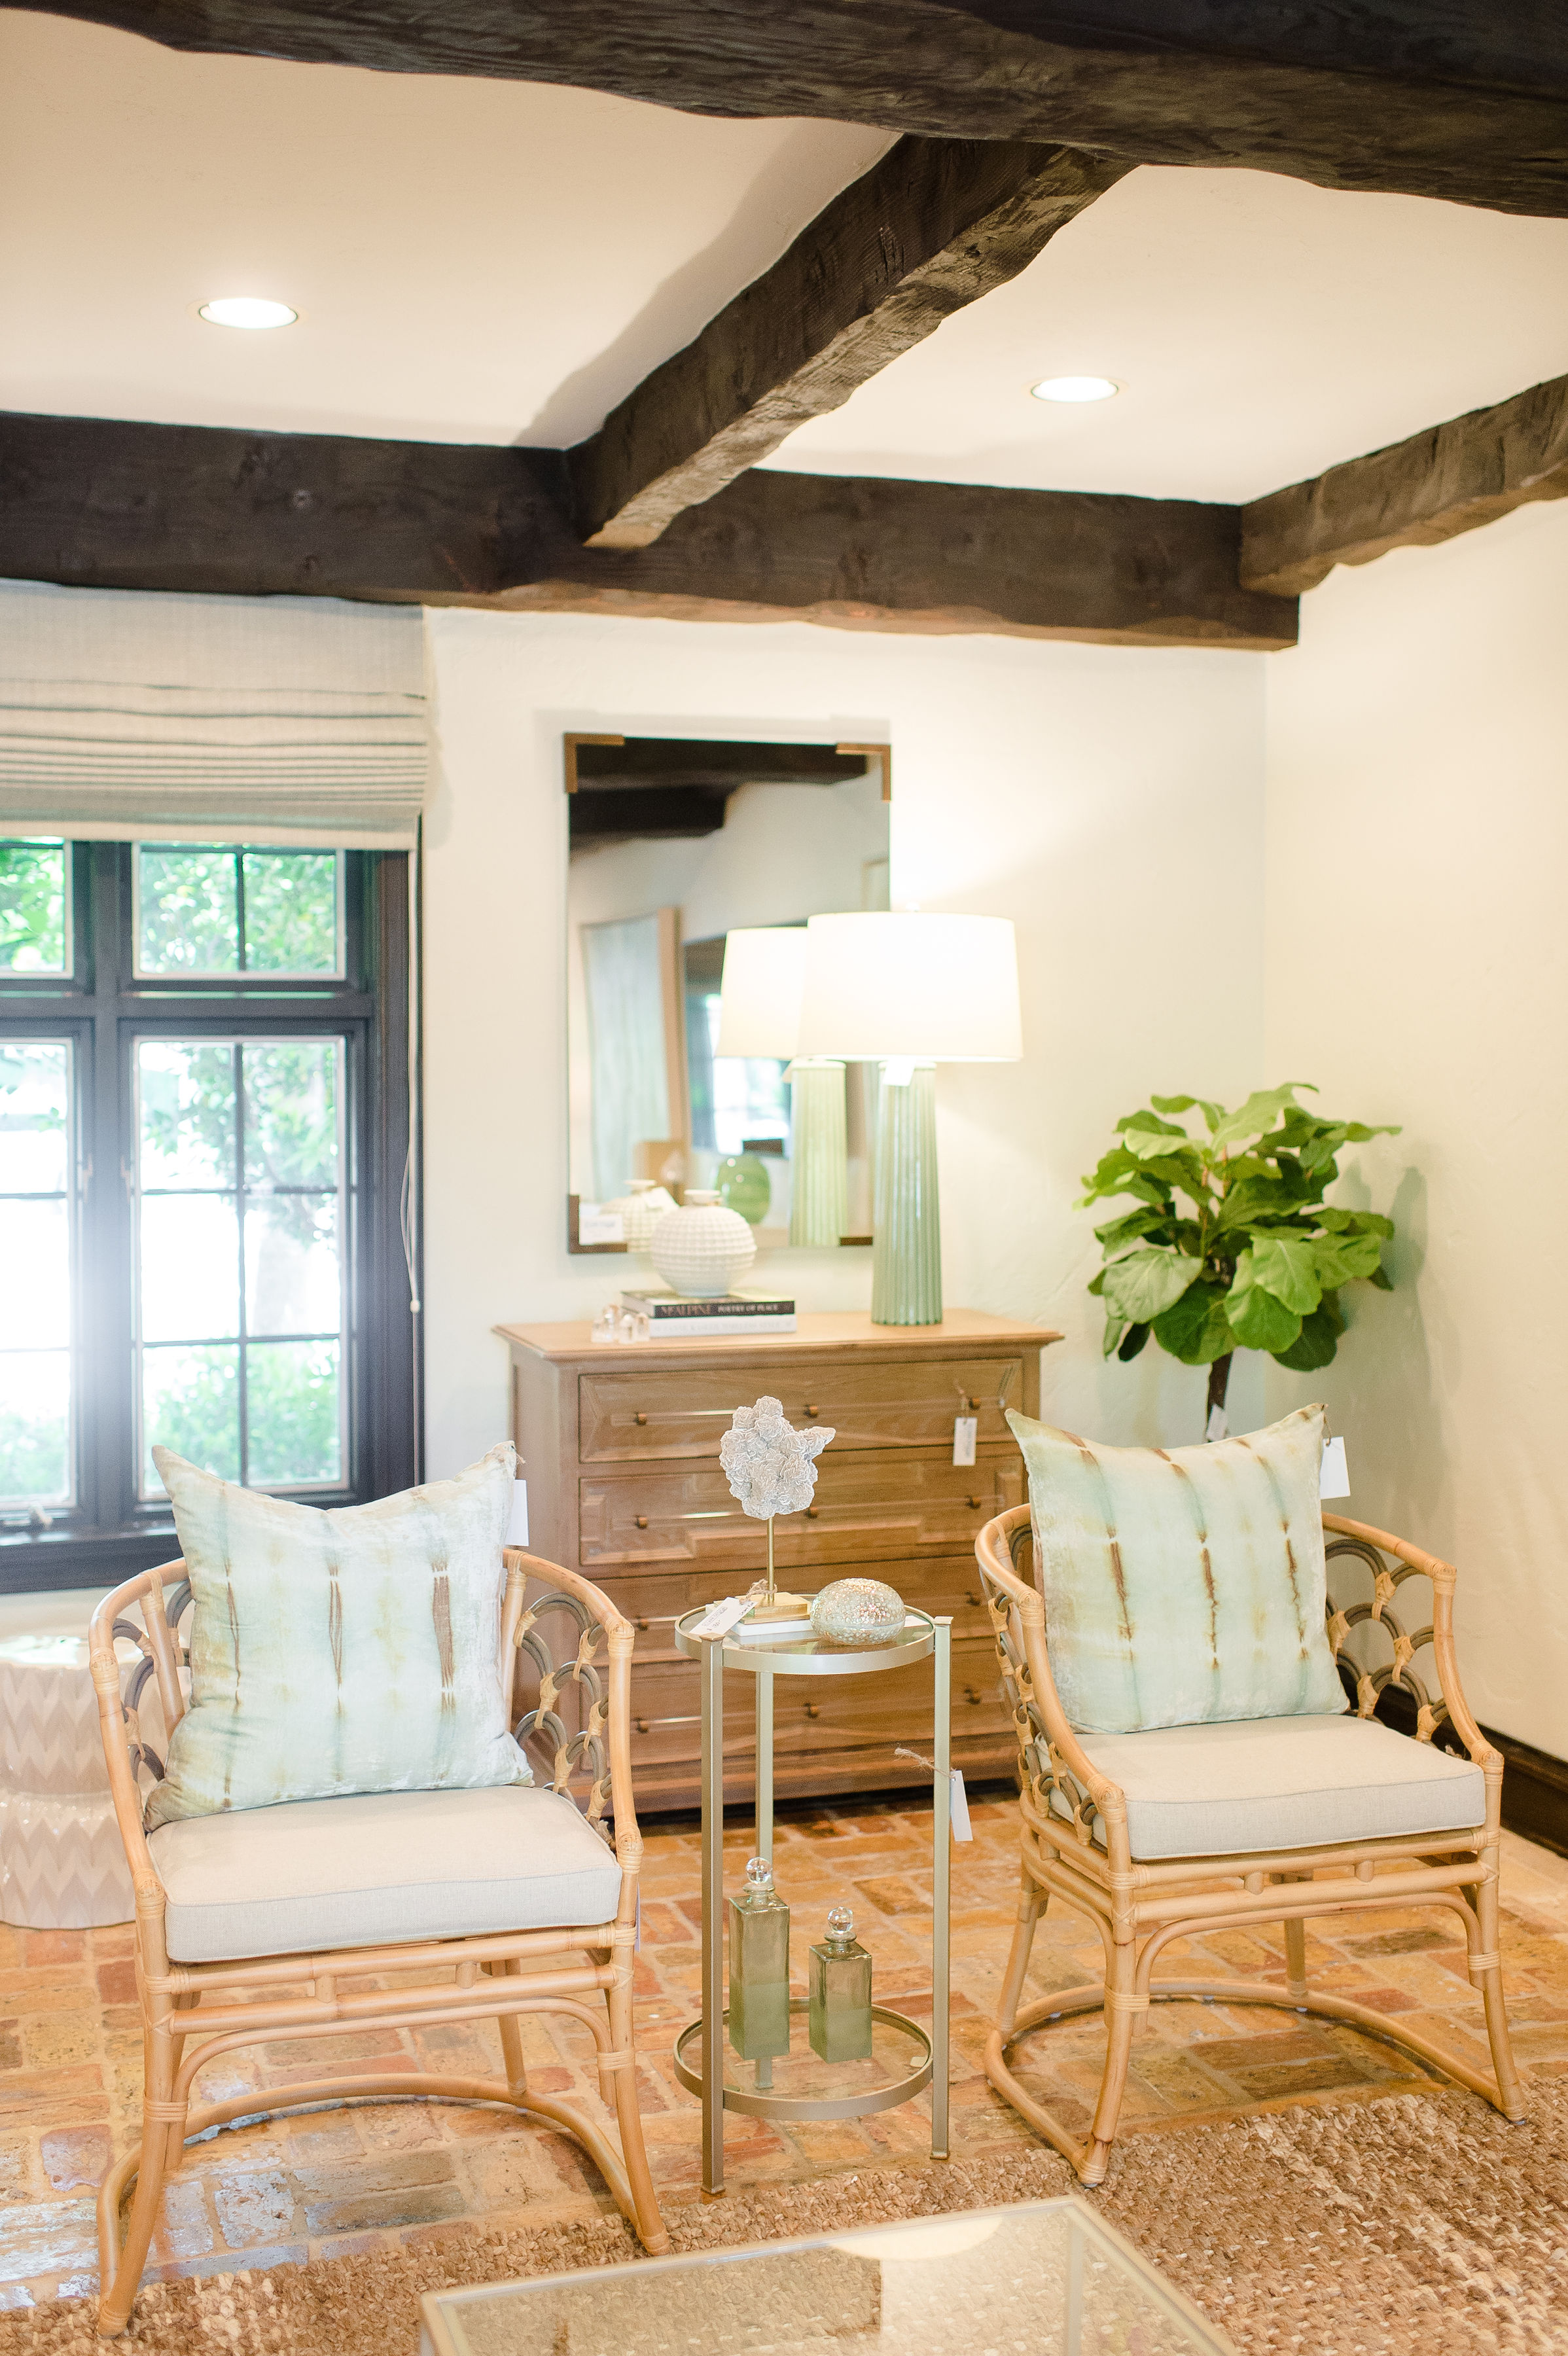 decorator-show-house-laura-park-wichita-falls-tx-interior-clark-design-studio.jpg